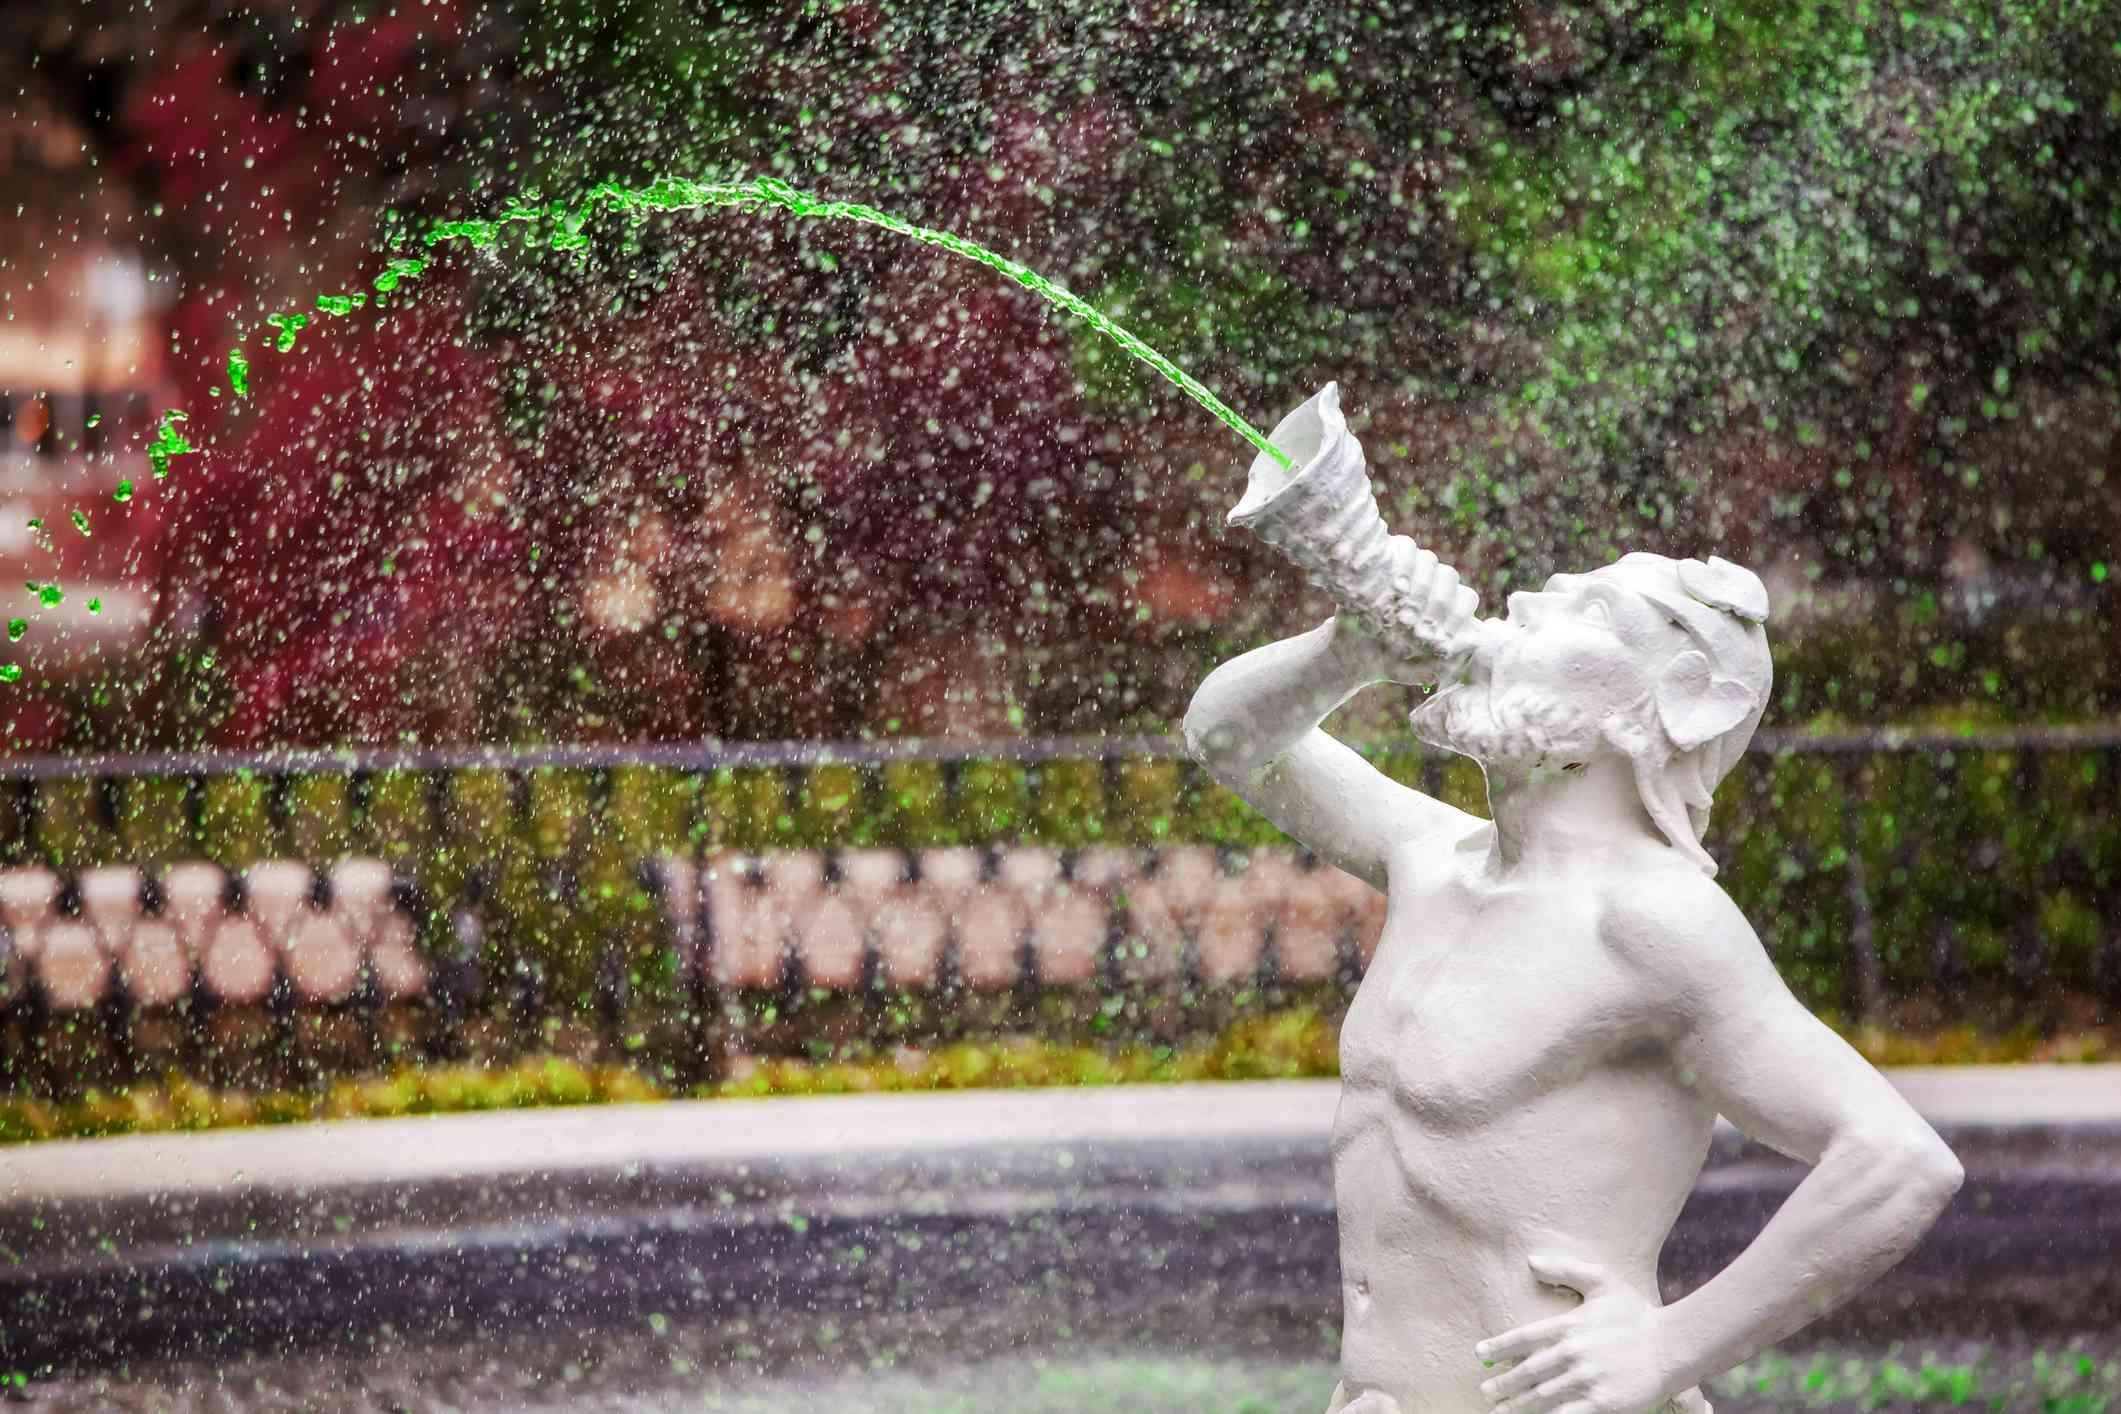 Forsyth Fountain dyed green in Savannah, Georgia, America